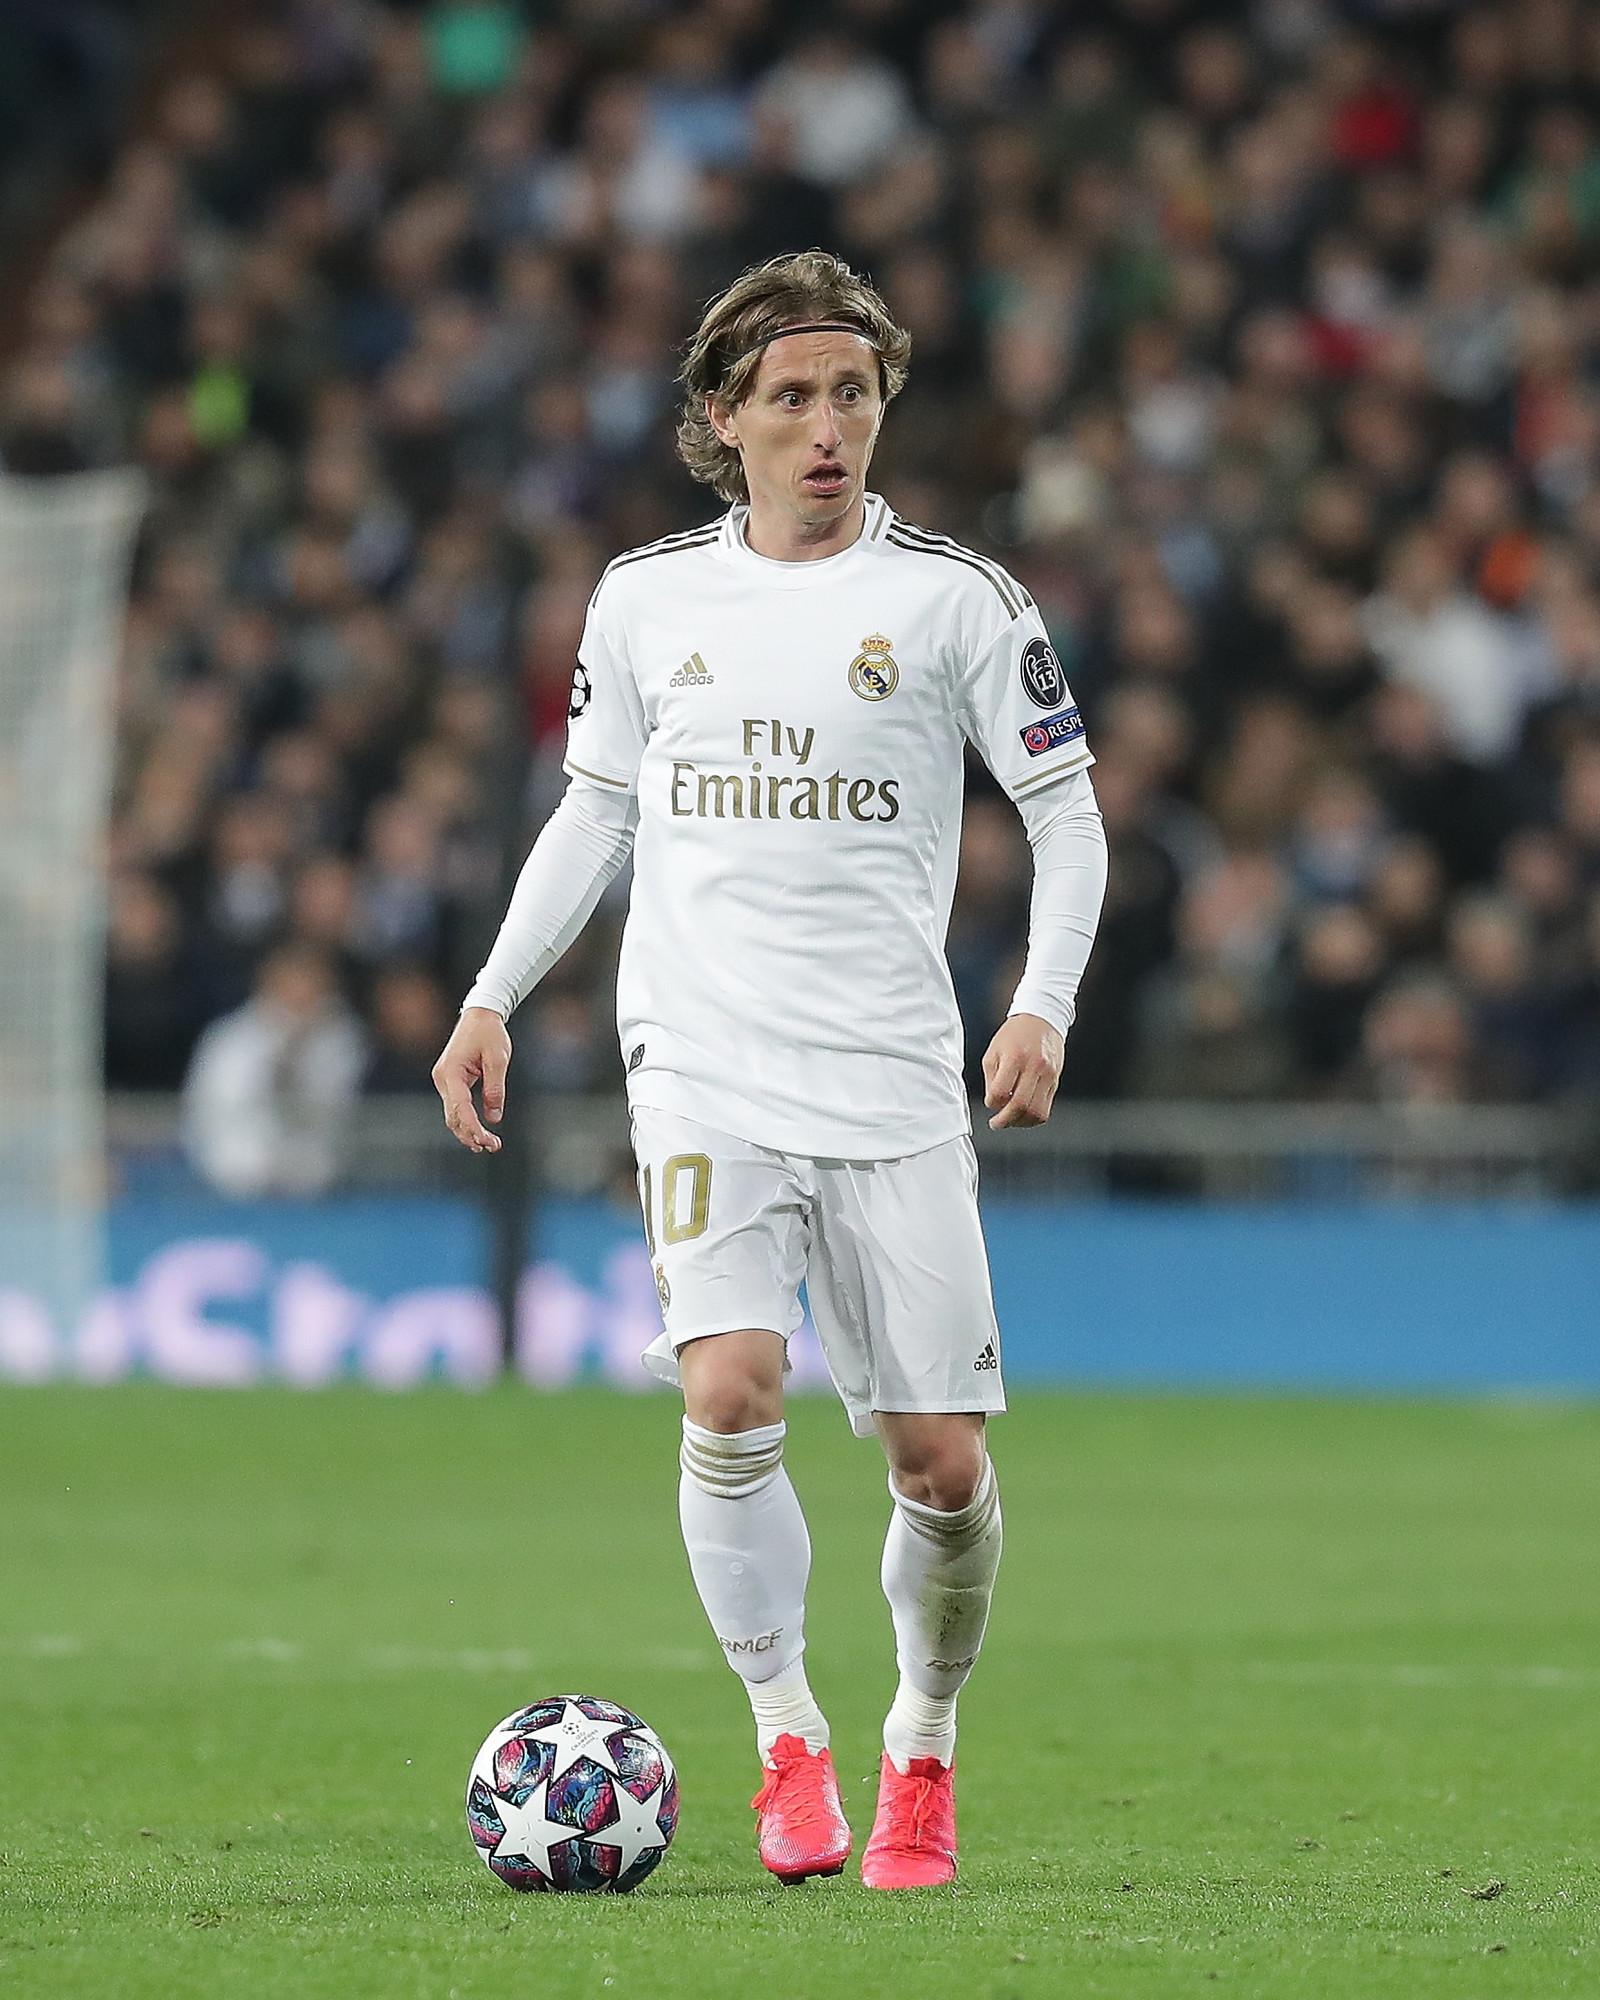 Lukas Modric (Real Madrid)